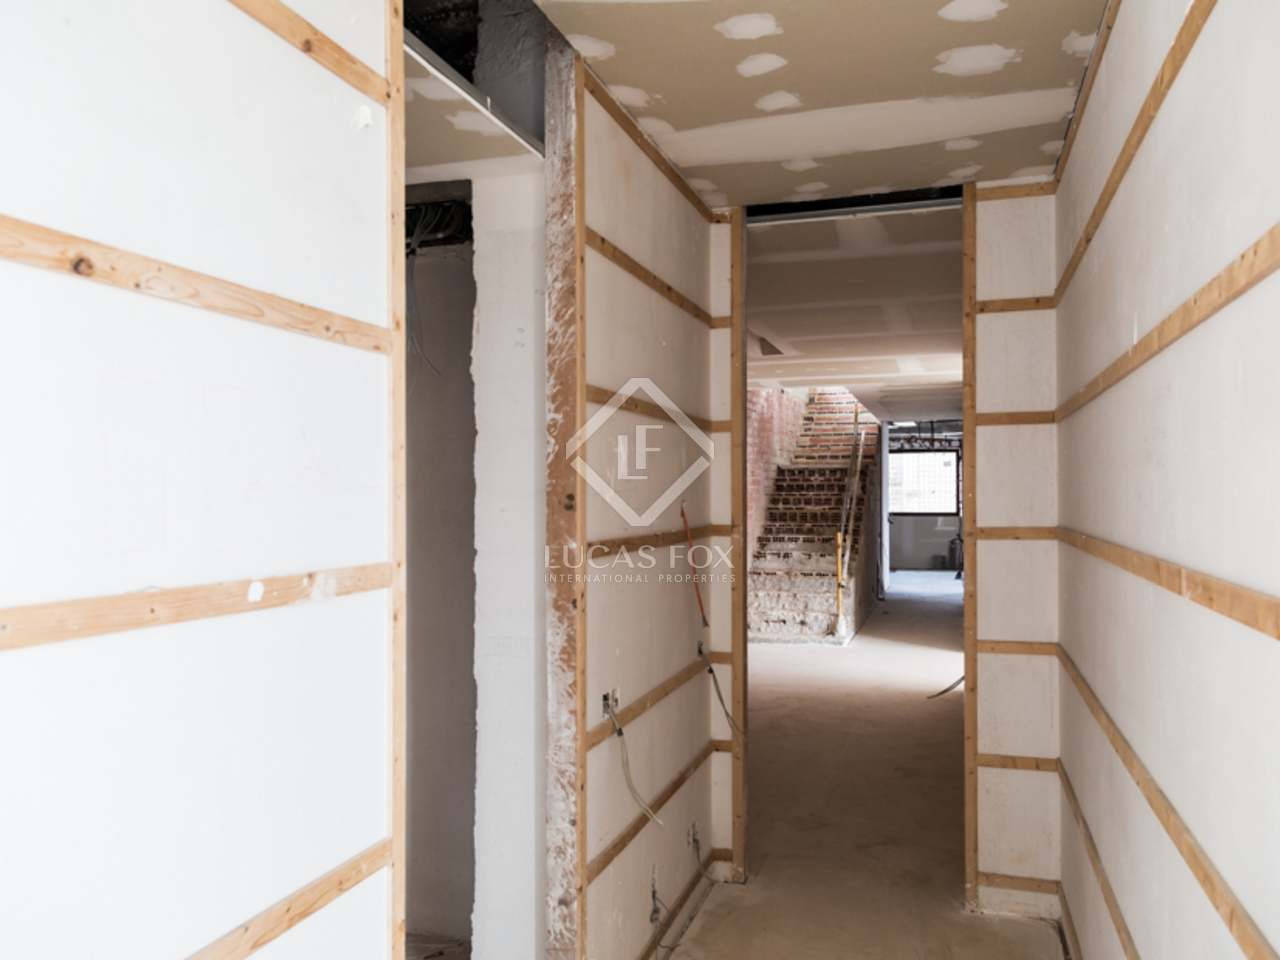 villa de luxe en vente godella valence. Black Bedroom Furniture Sets. Home Design Ideas